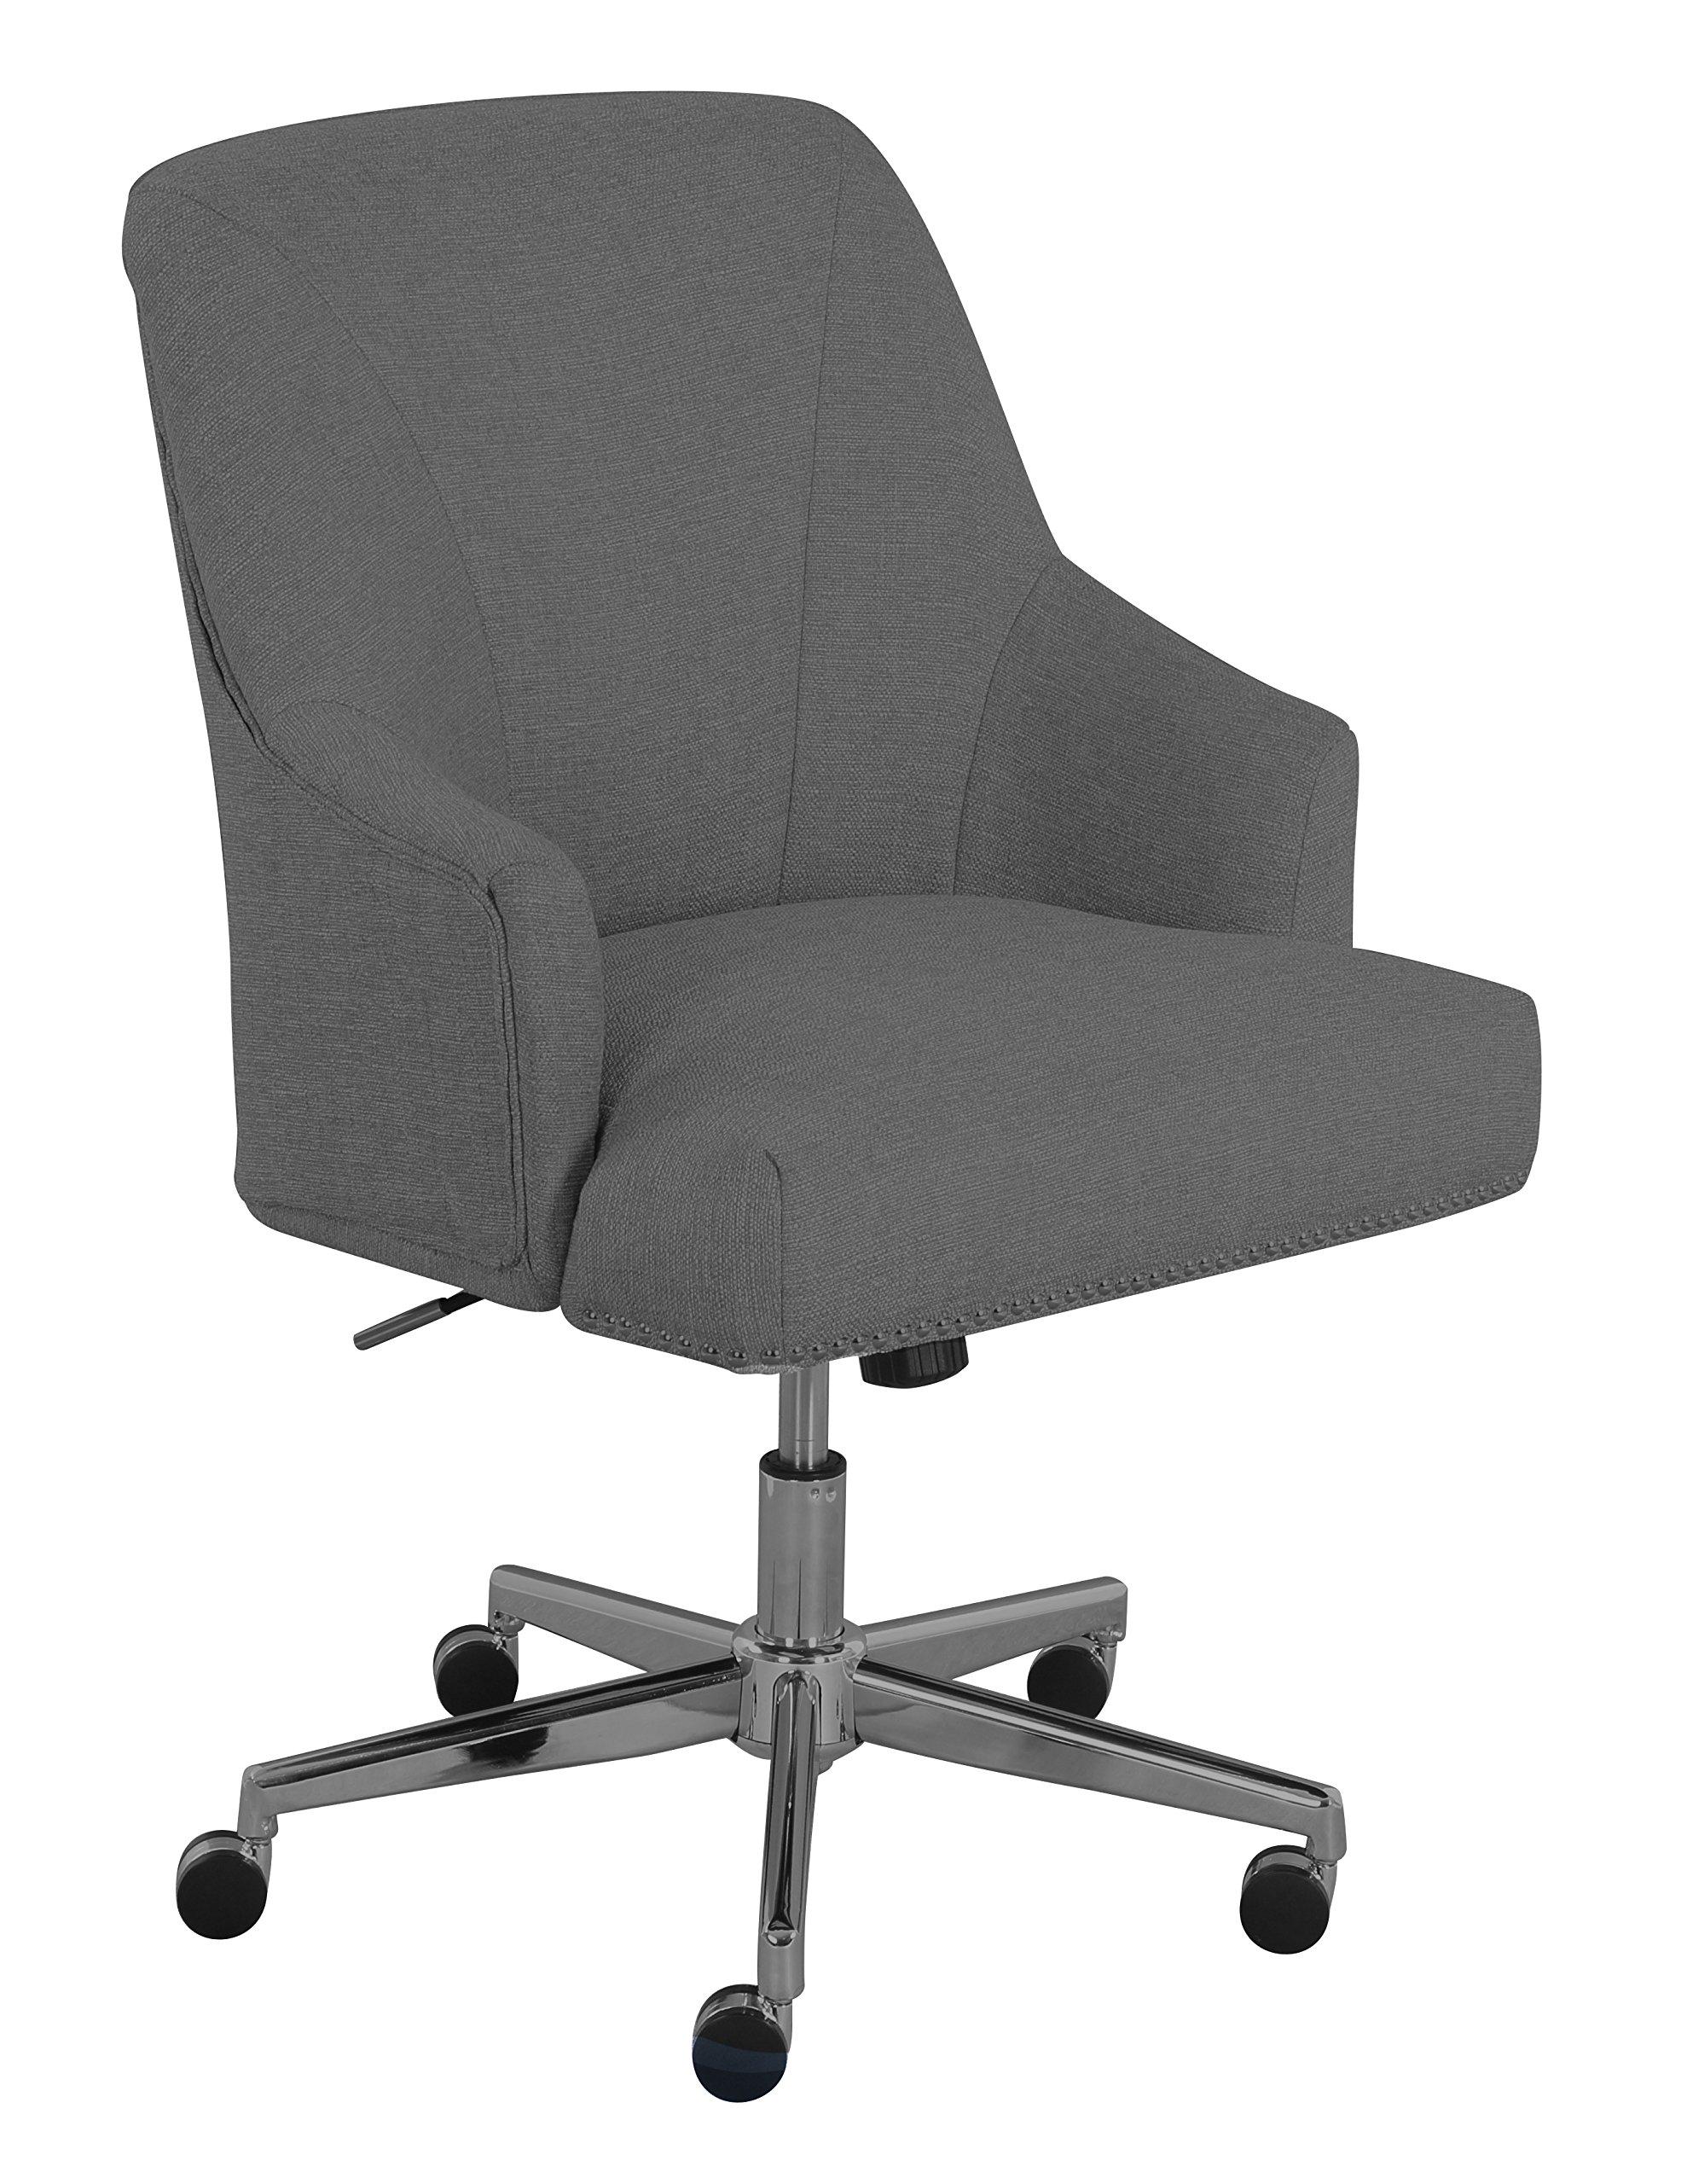 Serta ''Leighton'' Home Office Chair, Soft Medium Gray